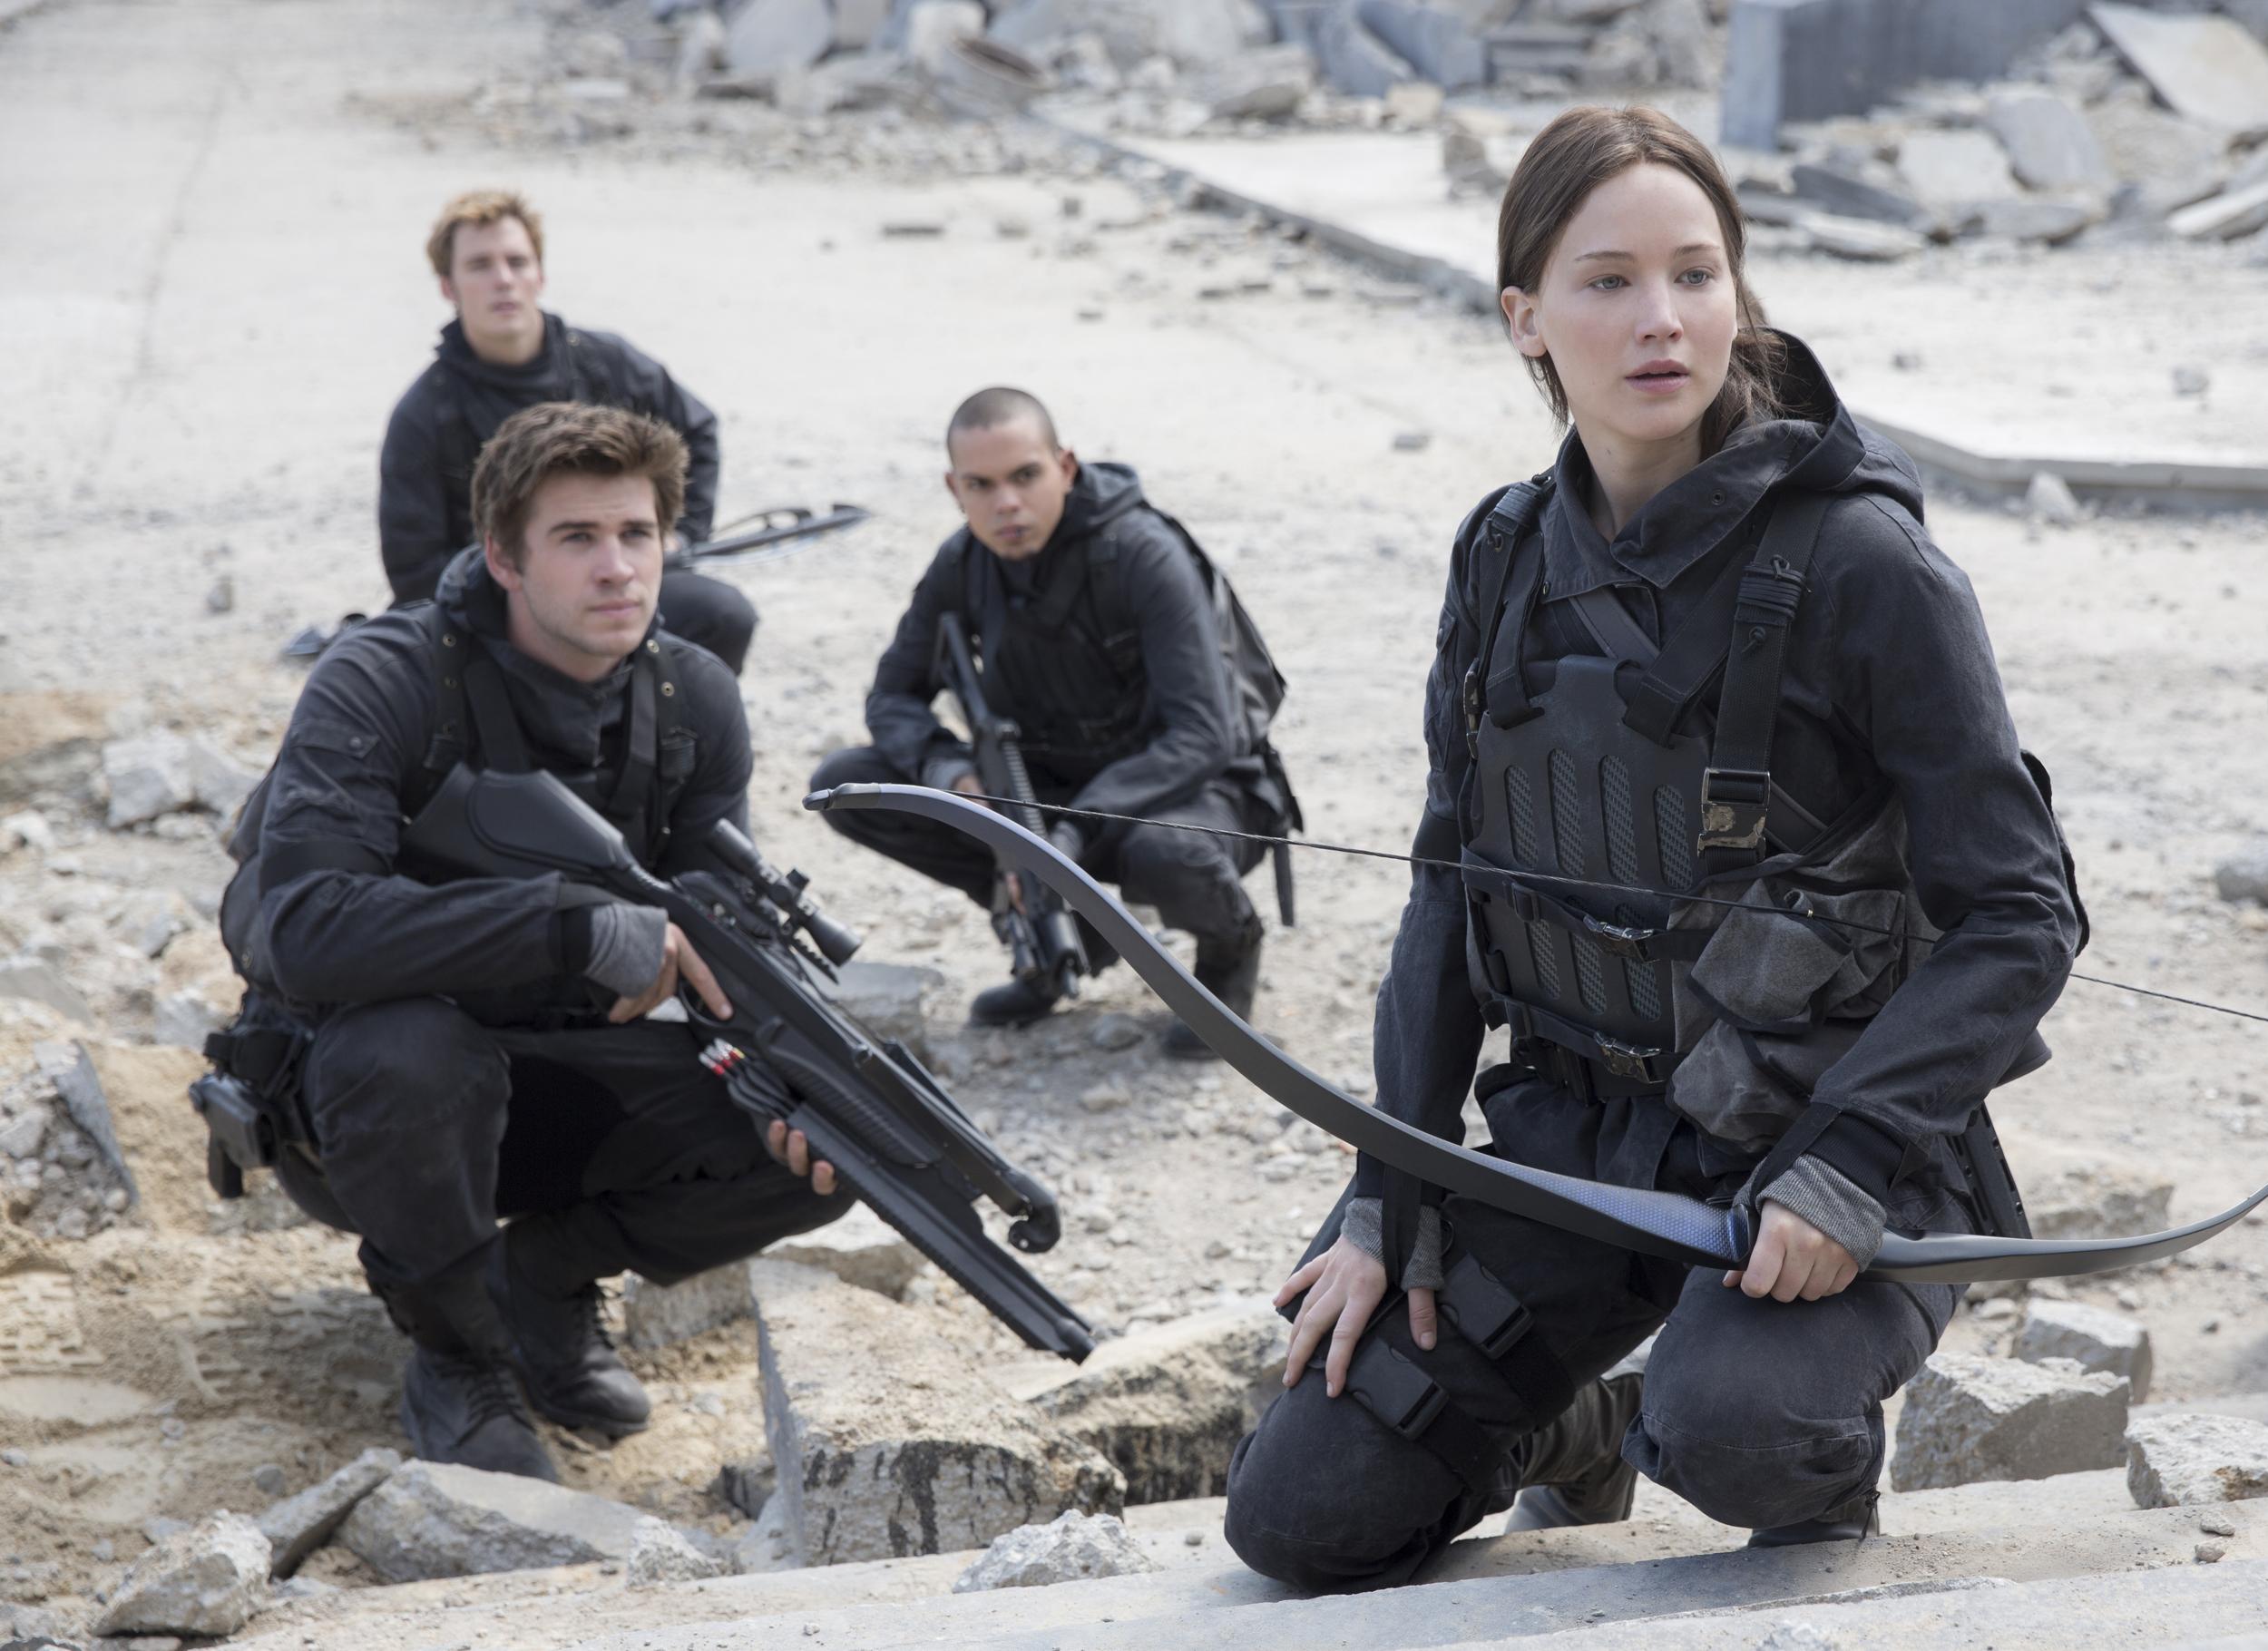 (Image courtesy of Lionsgate Publicity)